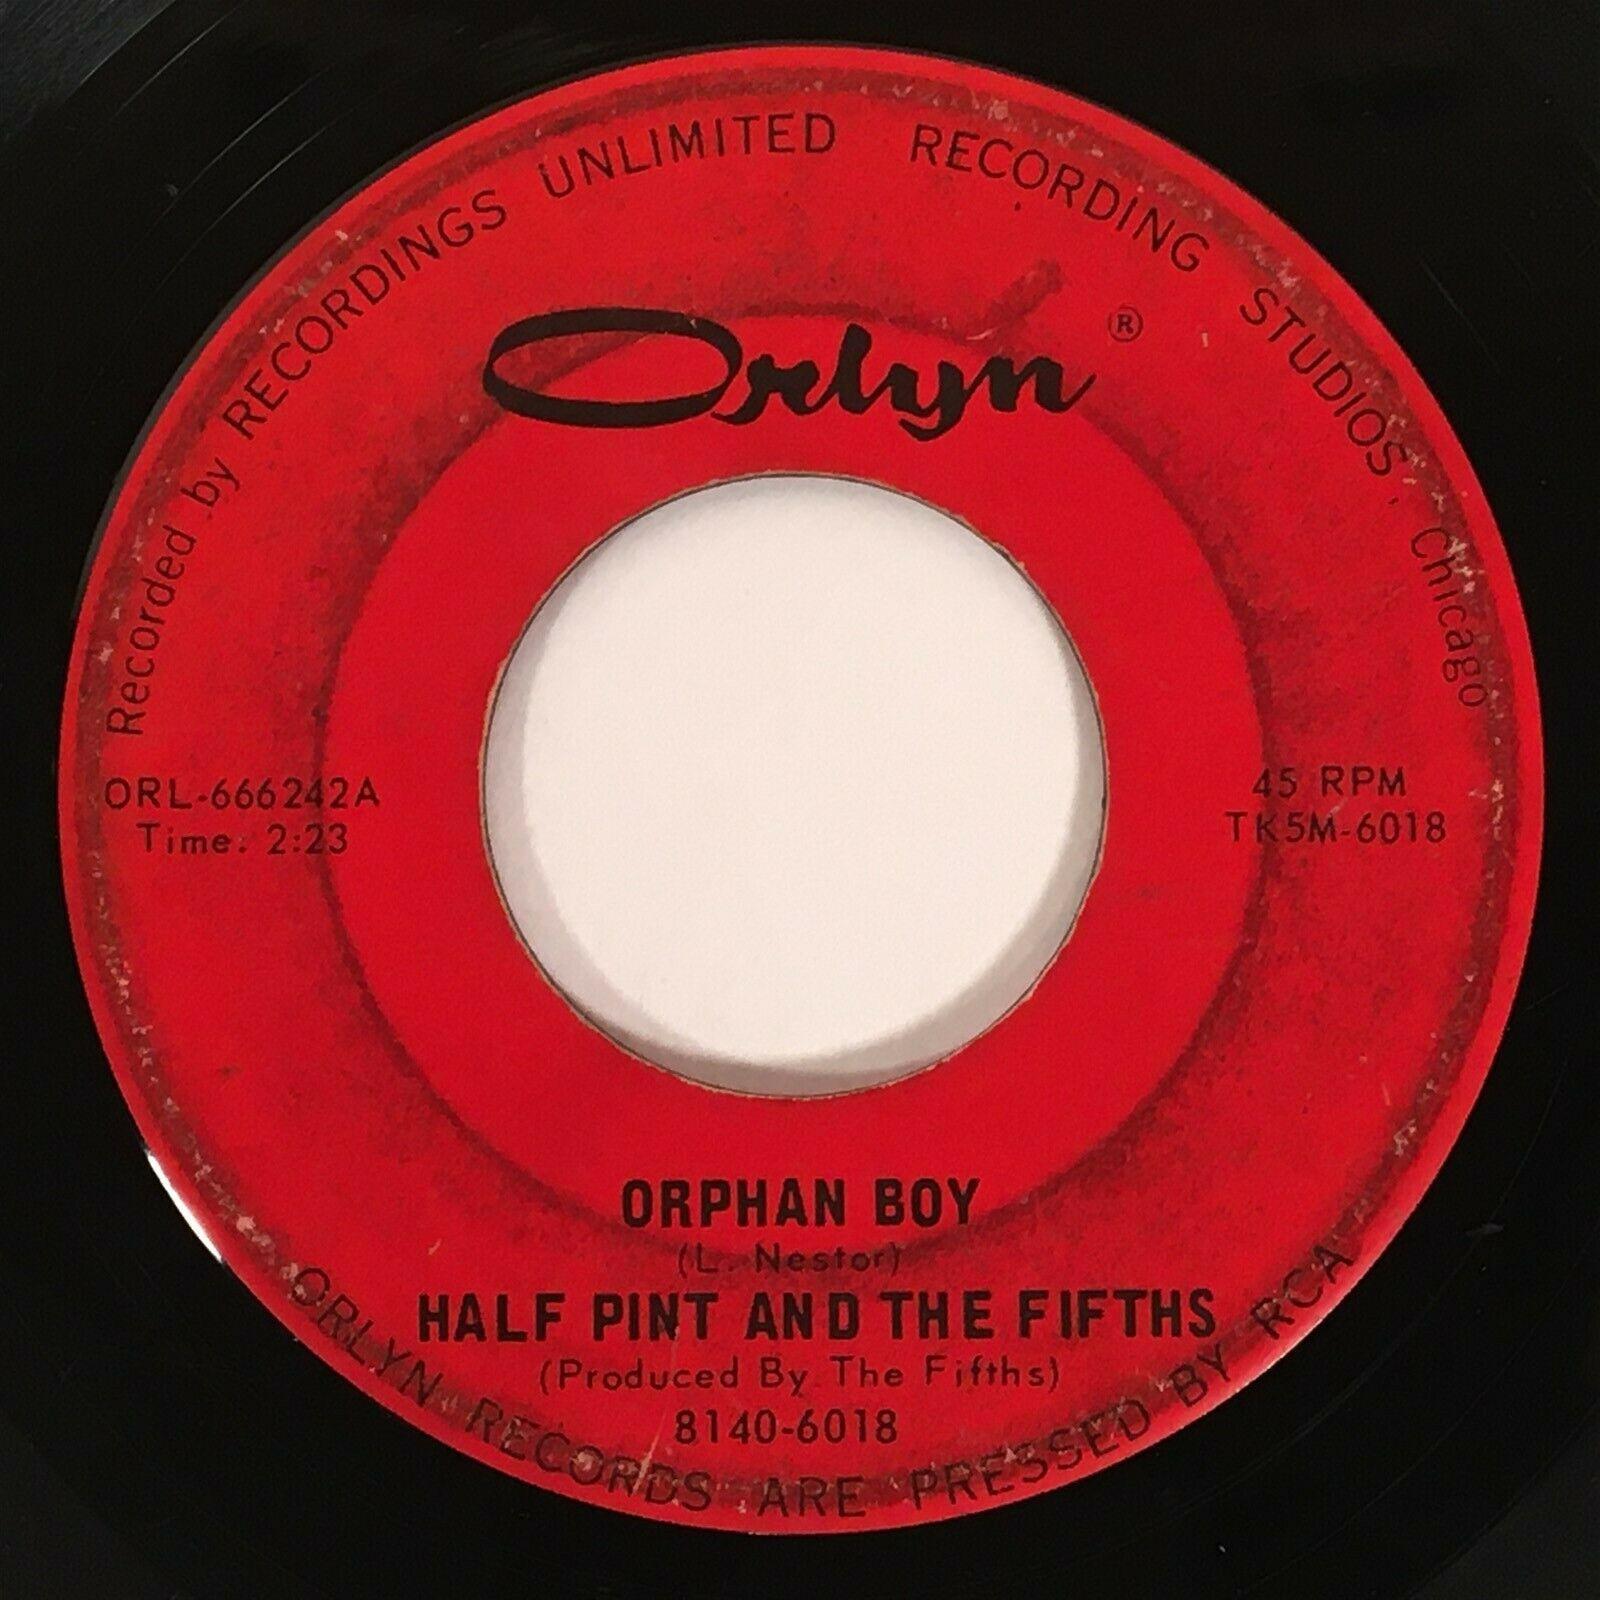 HALF PINT   THE FIFTHS Orphan Boy Orlyn BFTG Chicago Garage Monster 45 HEAR